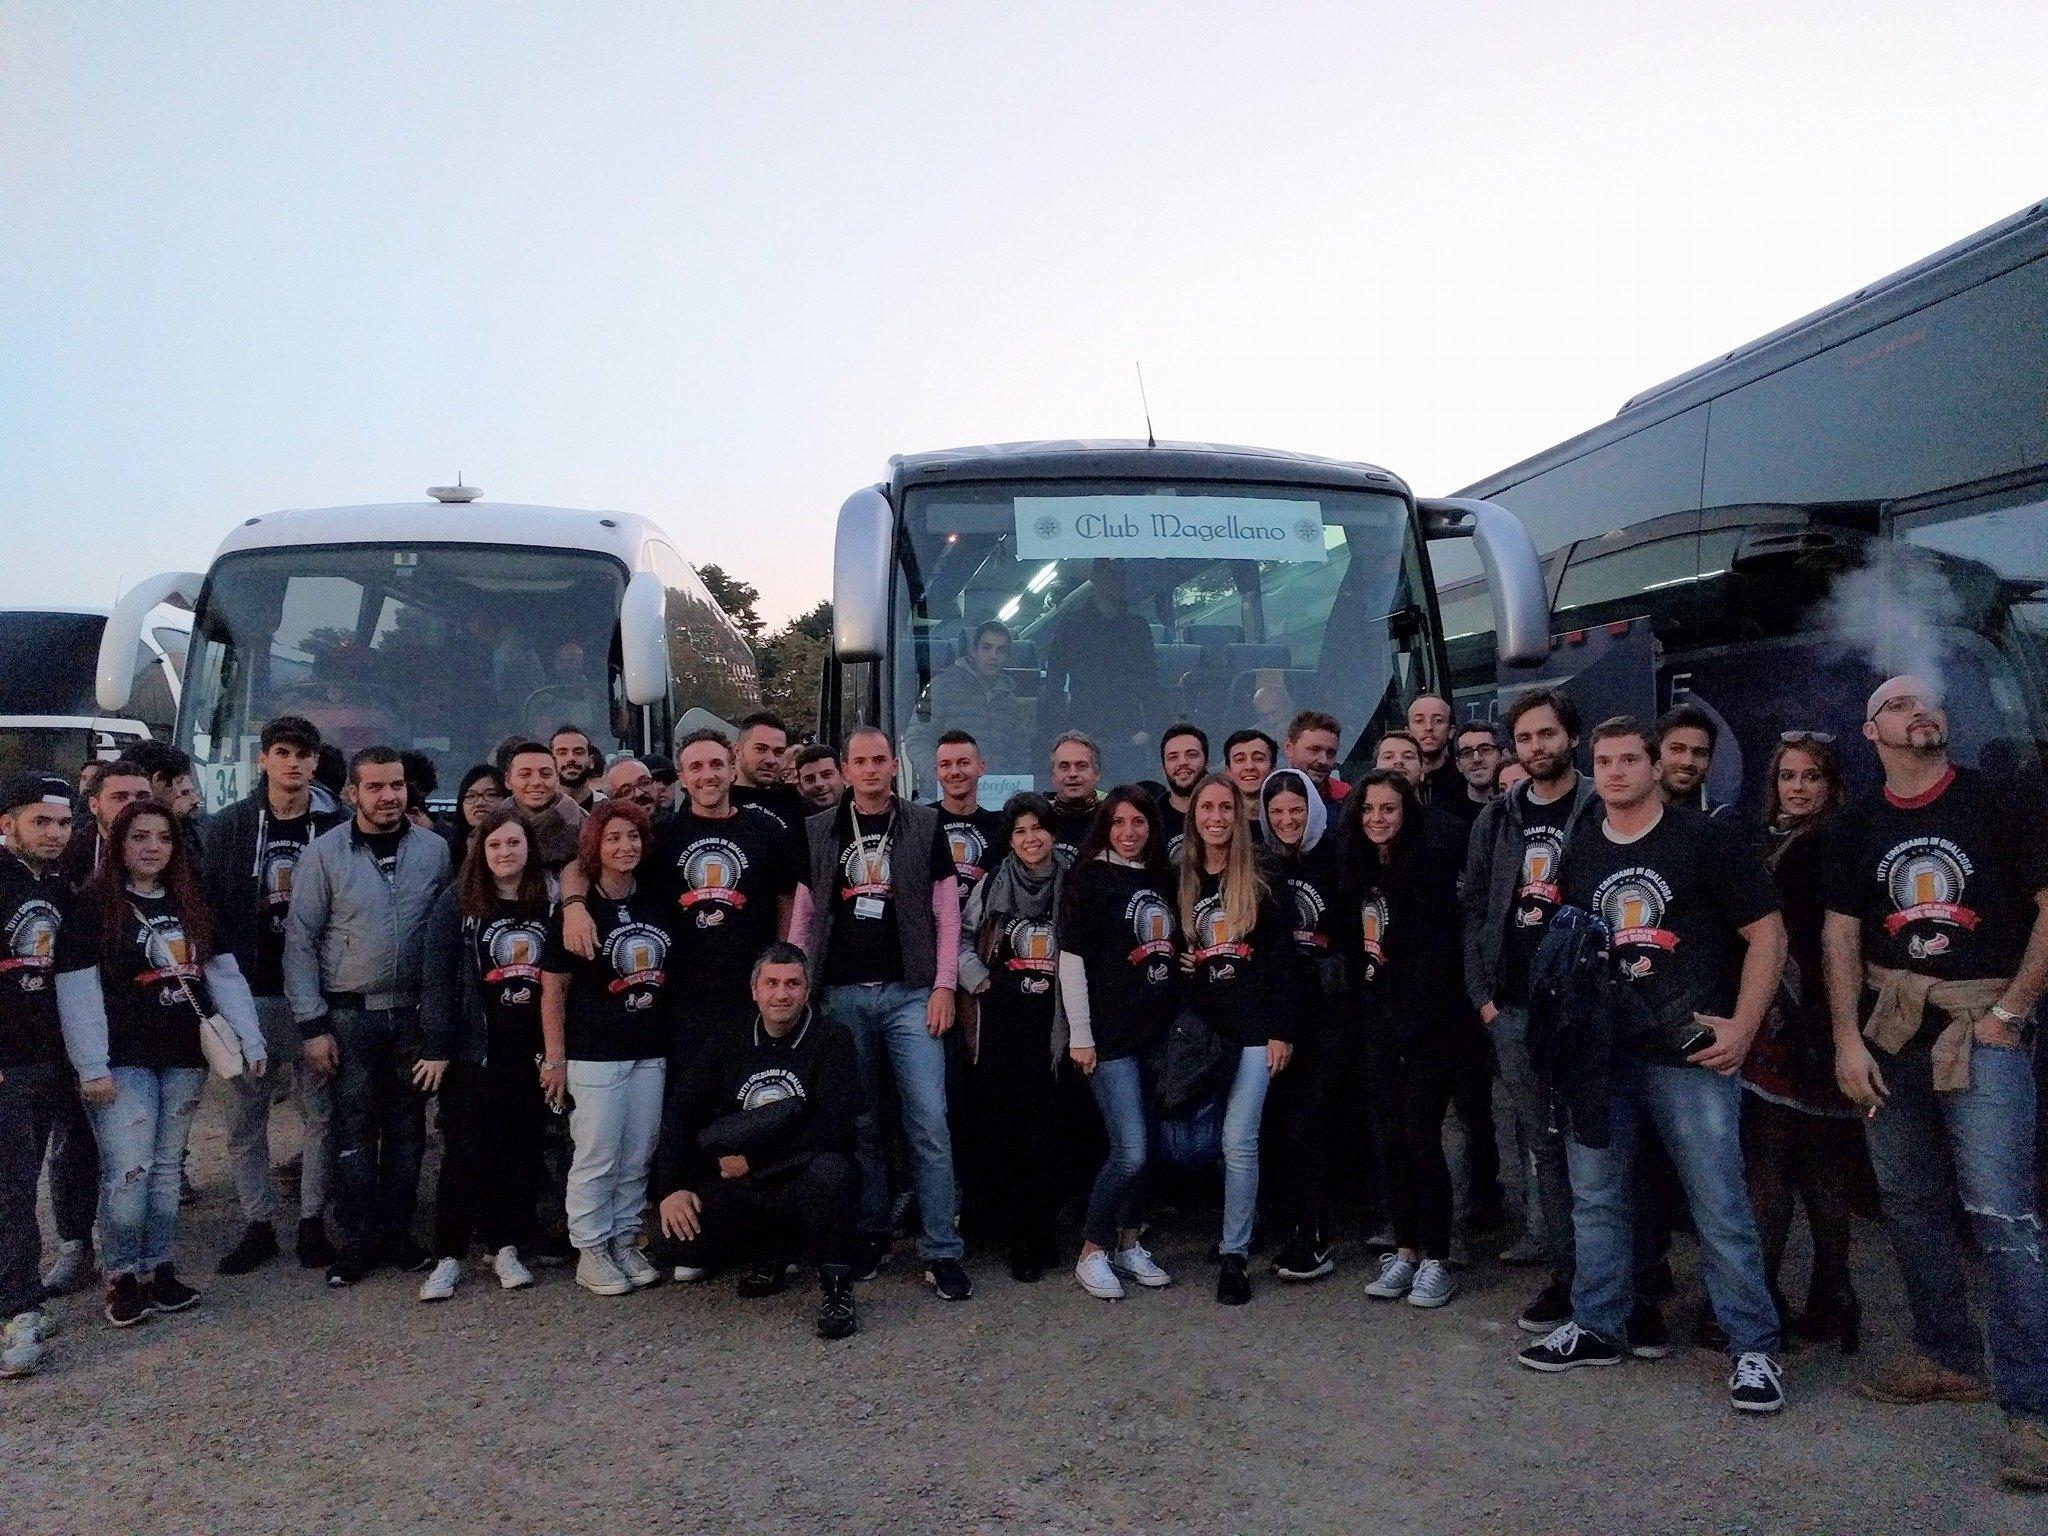 bus134-oktoberfest-clubmagellano